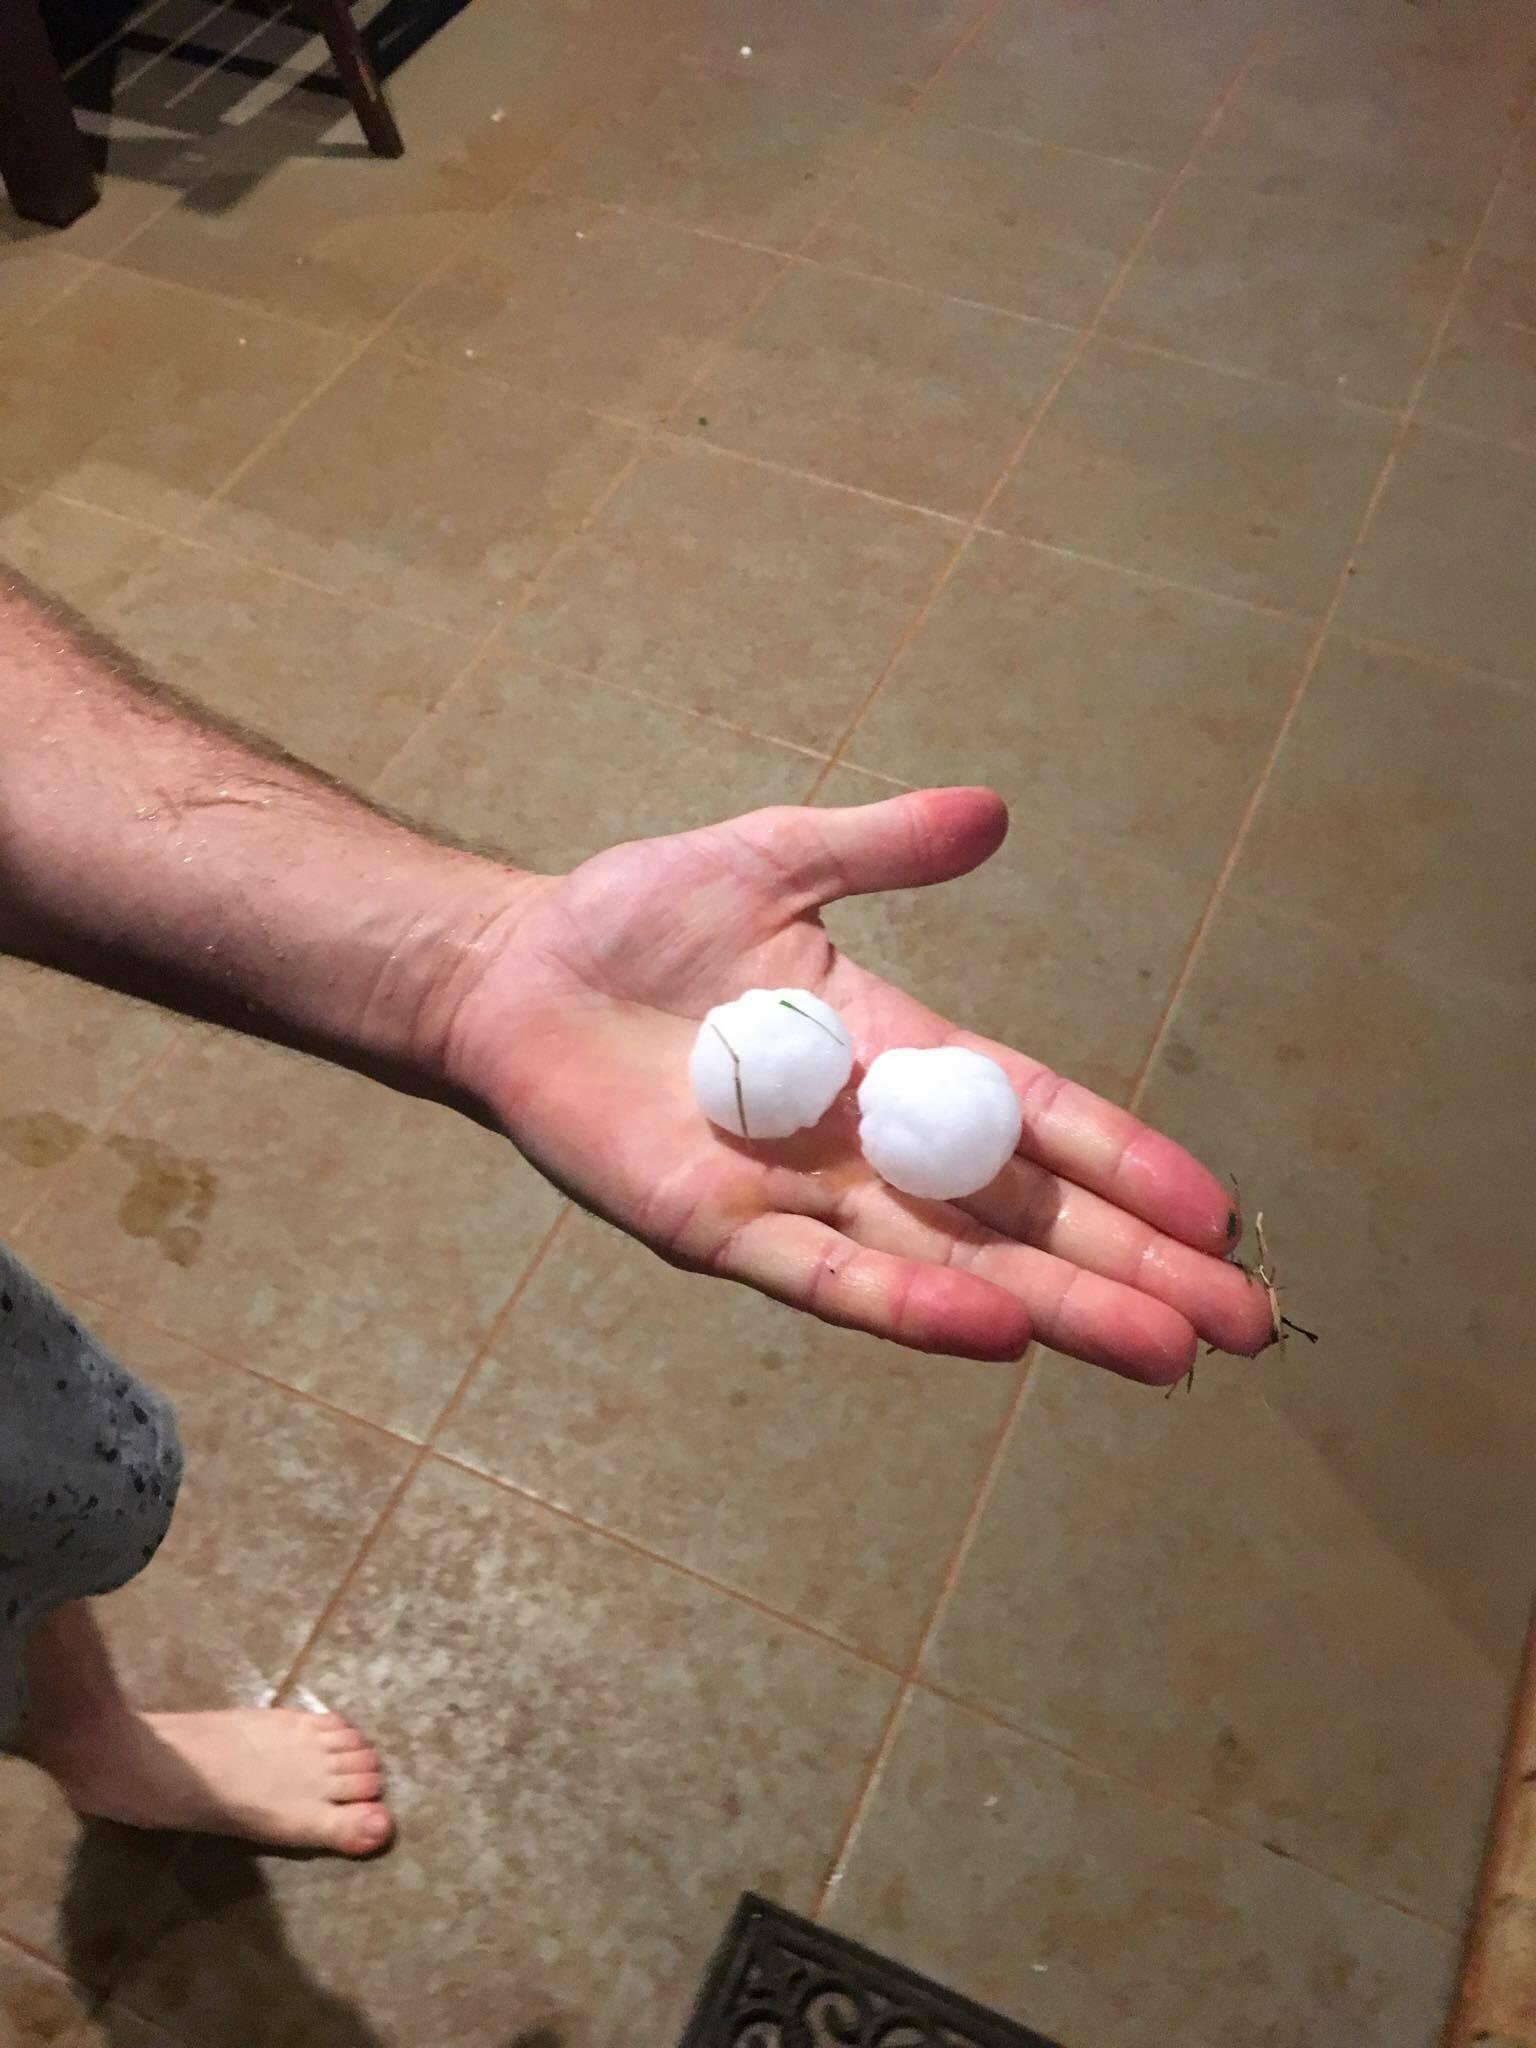 A photo of hail taken by Blake Scott at Wollongbar at 5pm on Sunday.